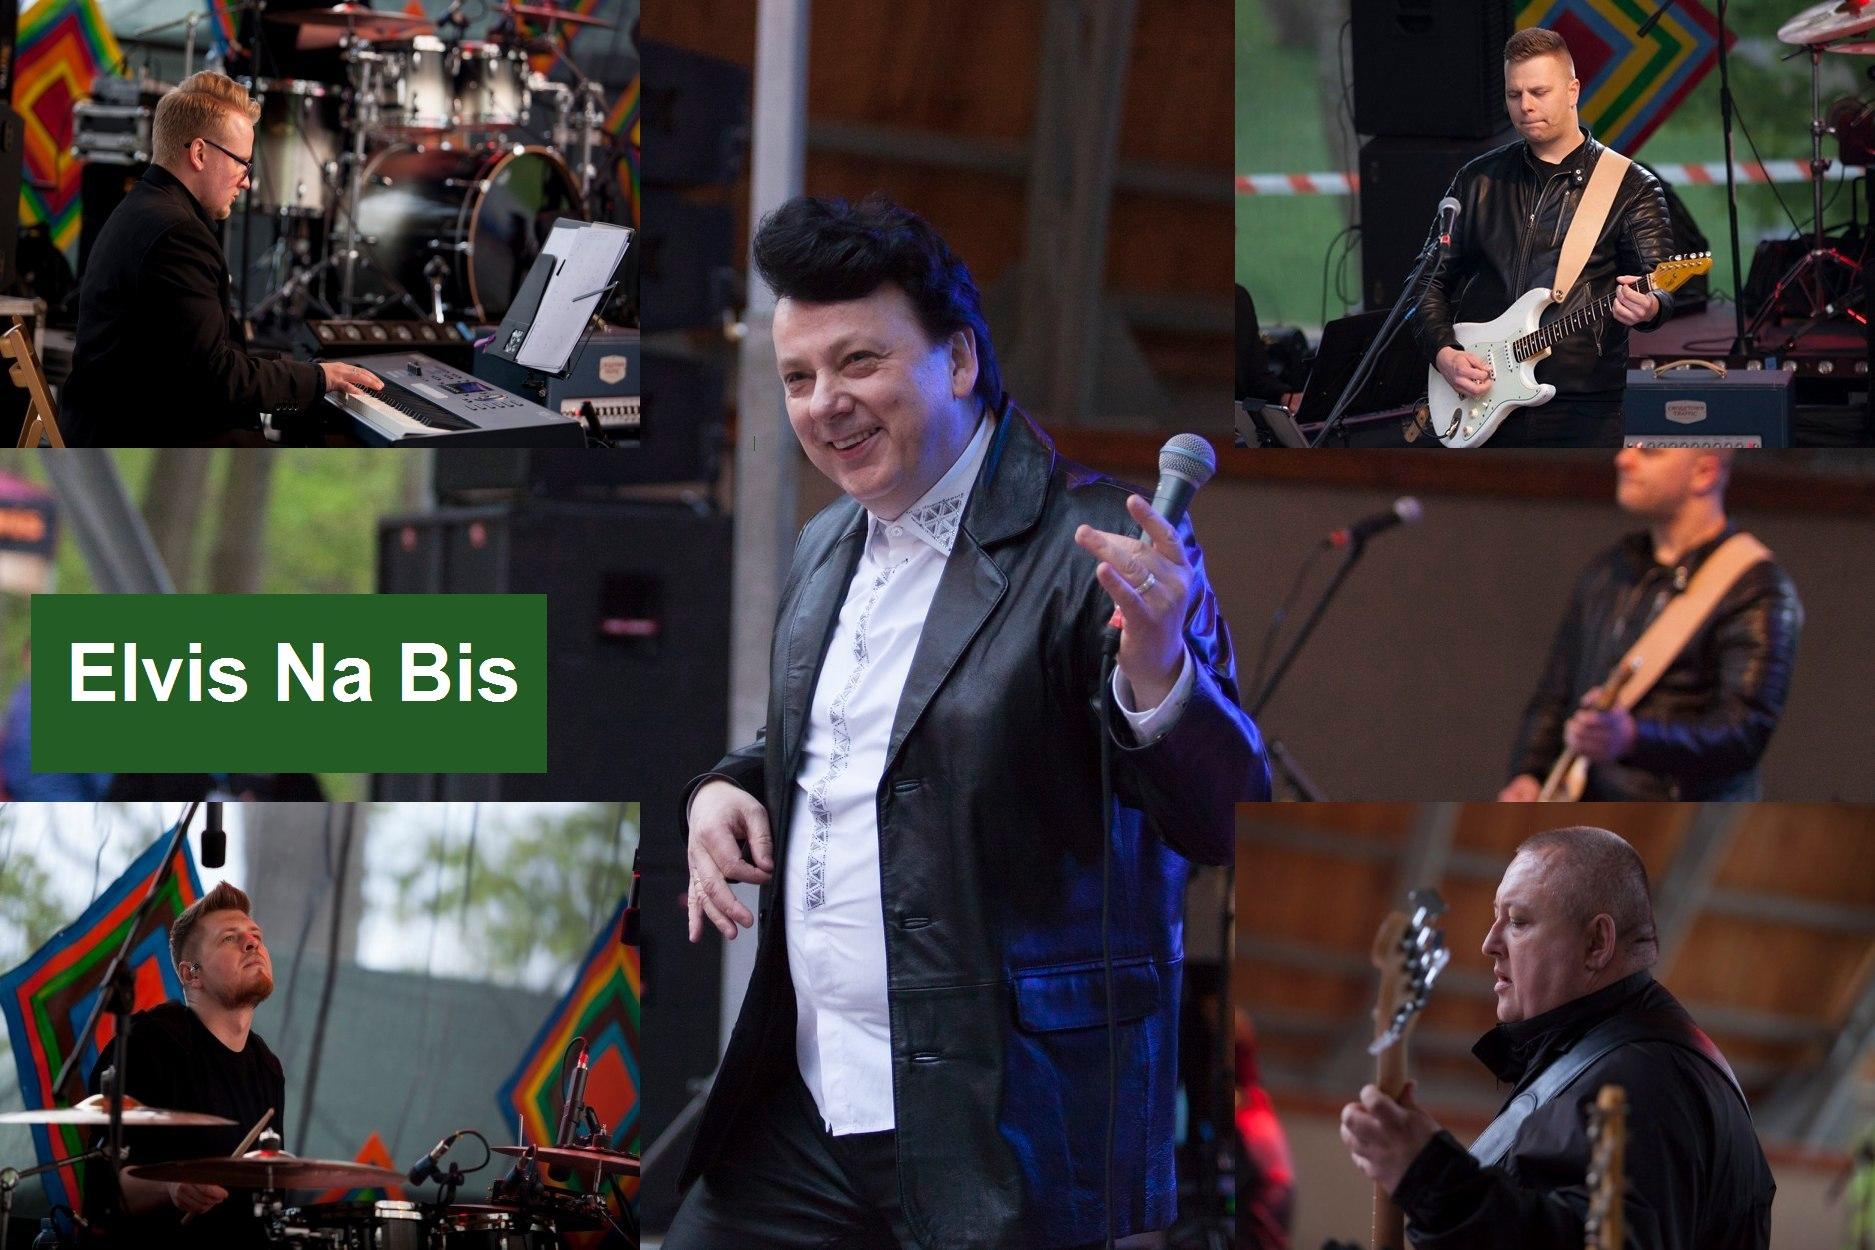 Polski Elvis Presley Elvis Na Bis - Mirosław Deredas